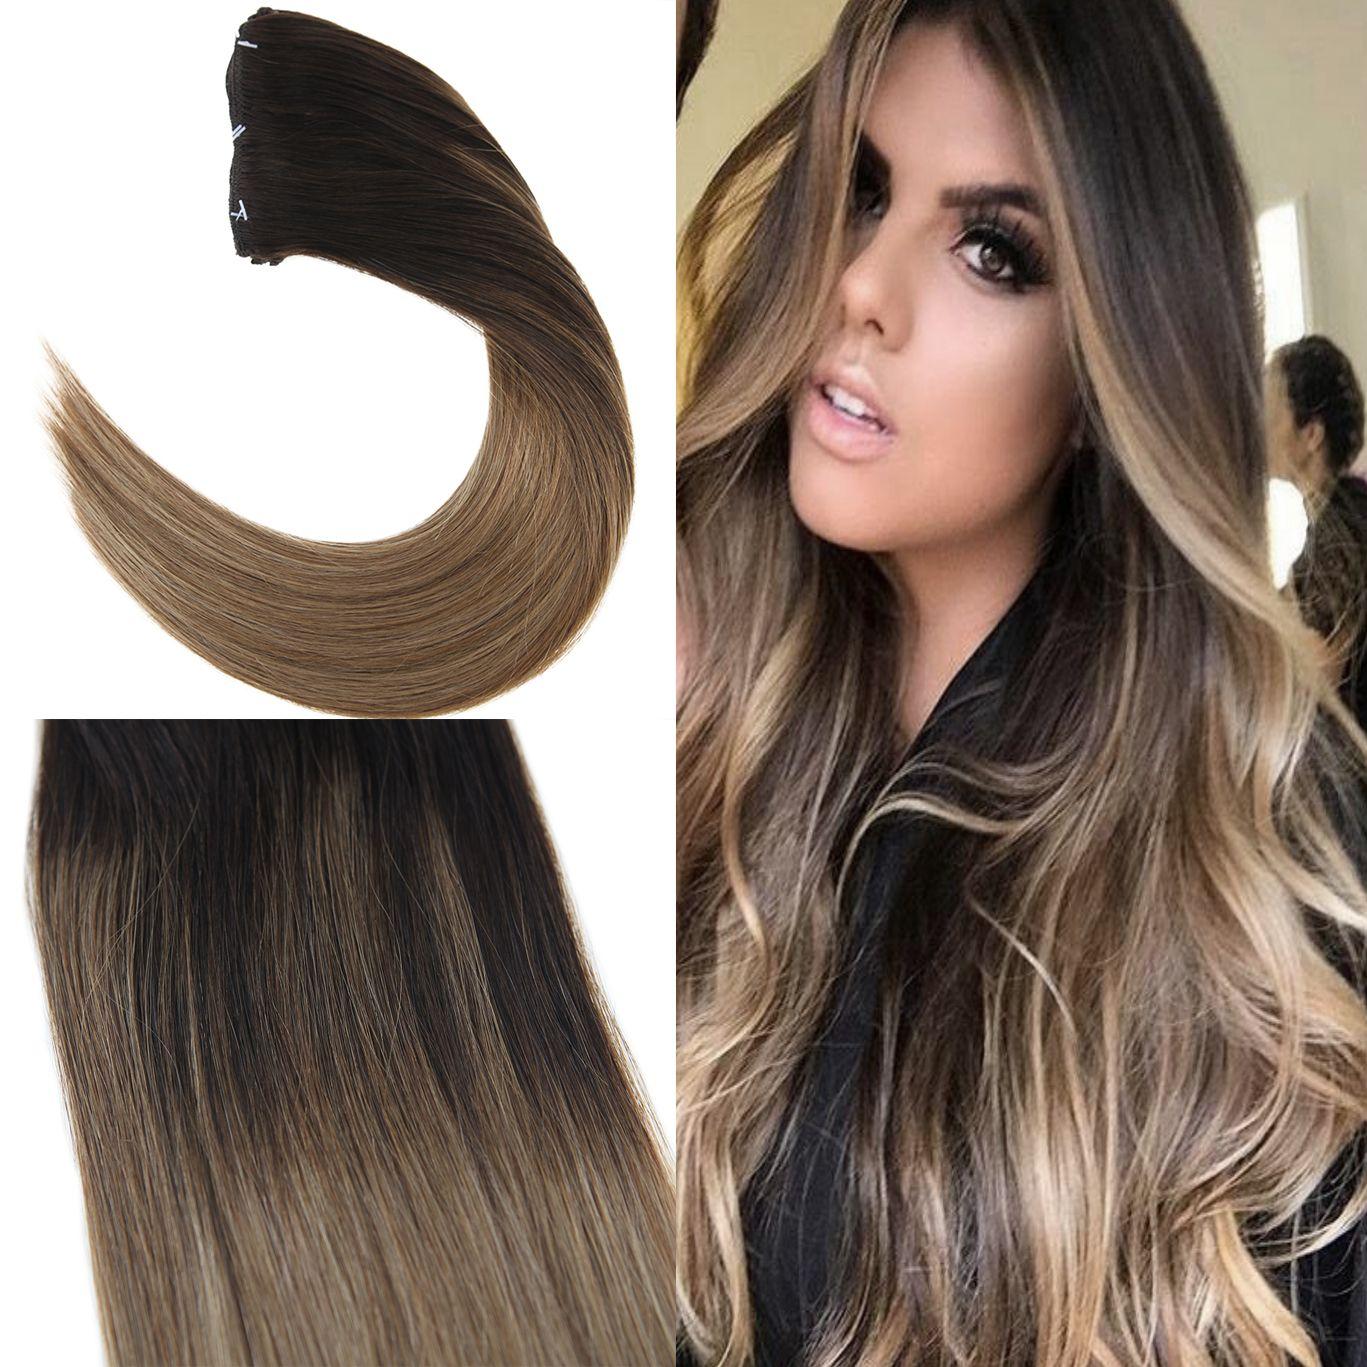 Full Head Clip In Human Hair Extensions Youngsee Ombre Clip In Real Remy Soft Hair Extensions F Human Hair Extensions Clip In Hair Extensions Human Hair Color